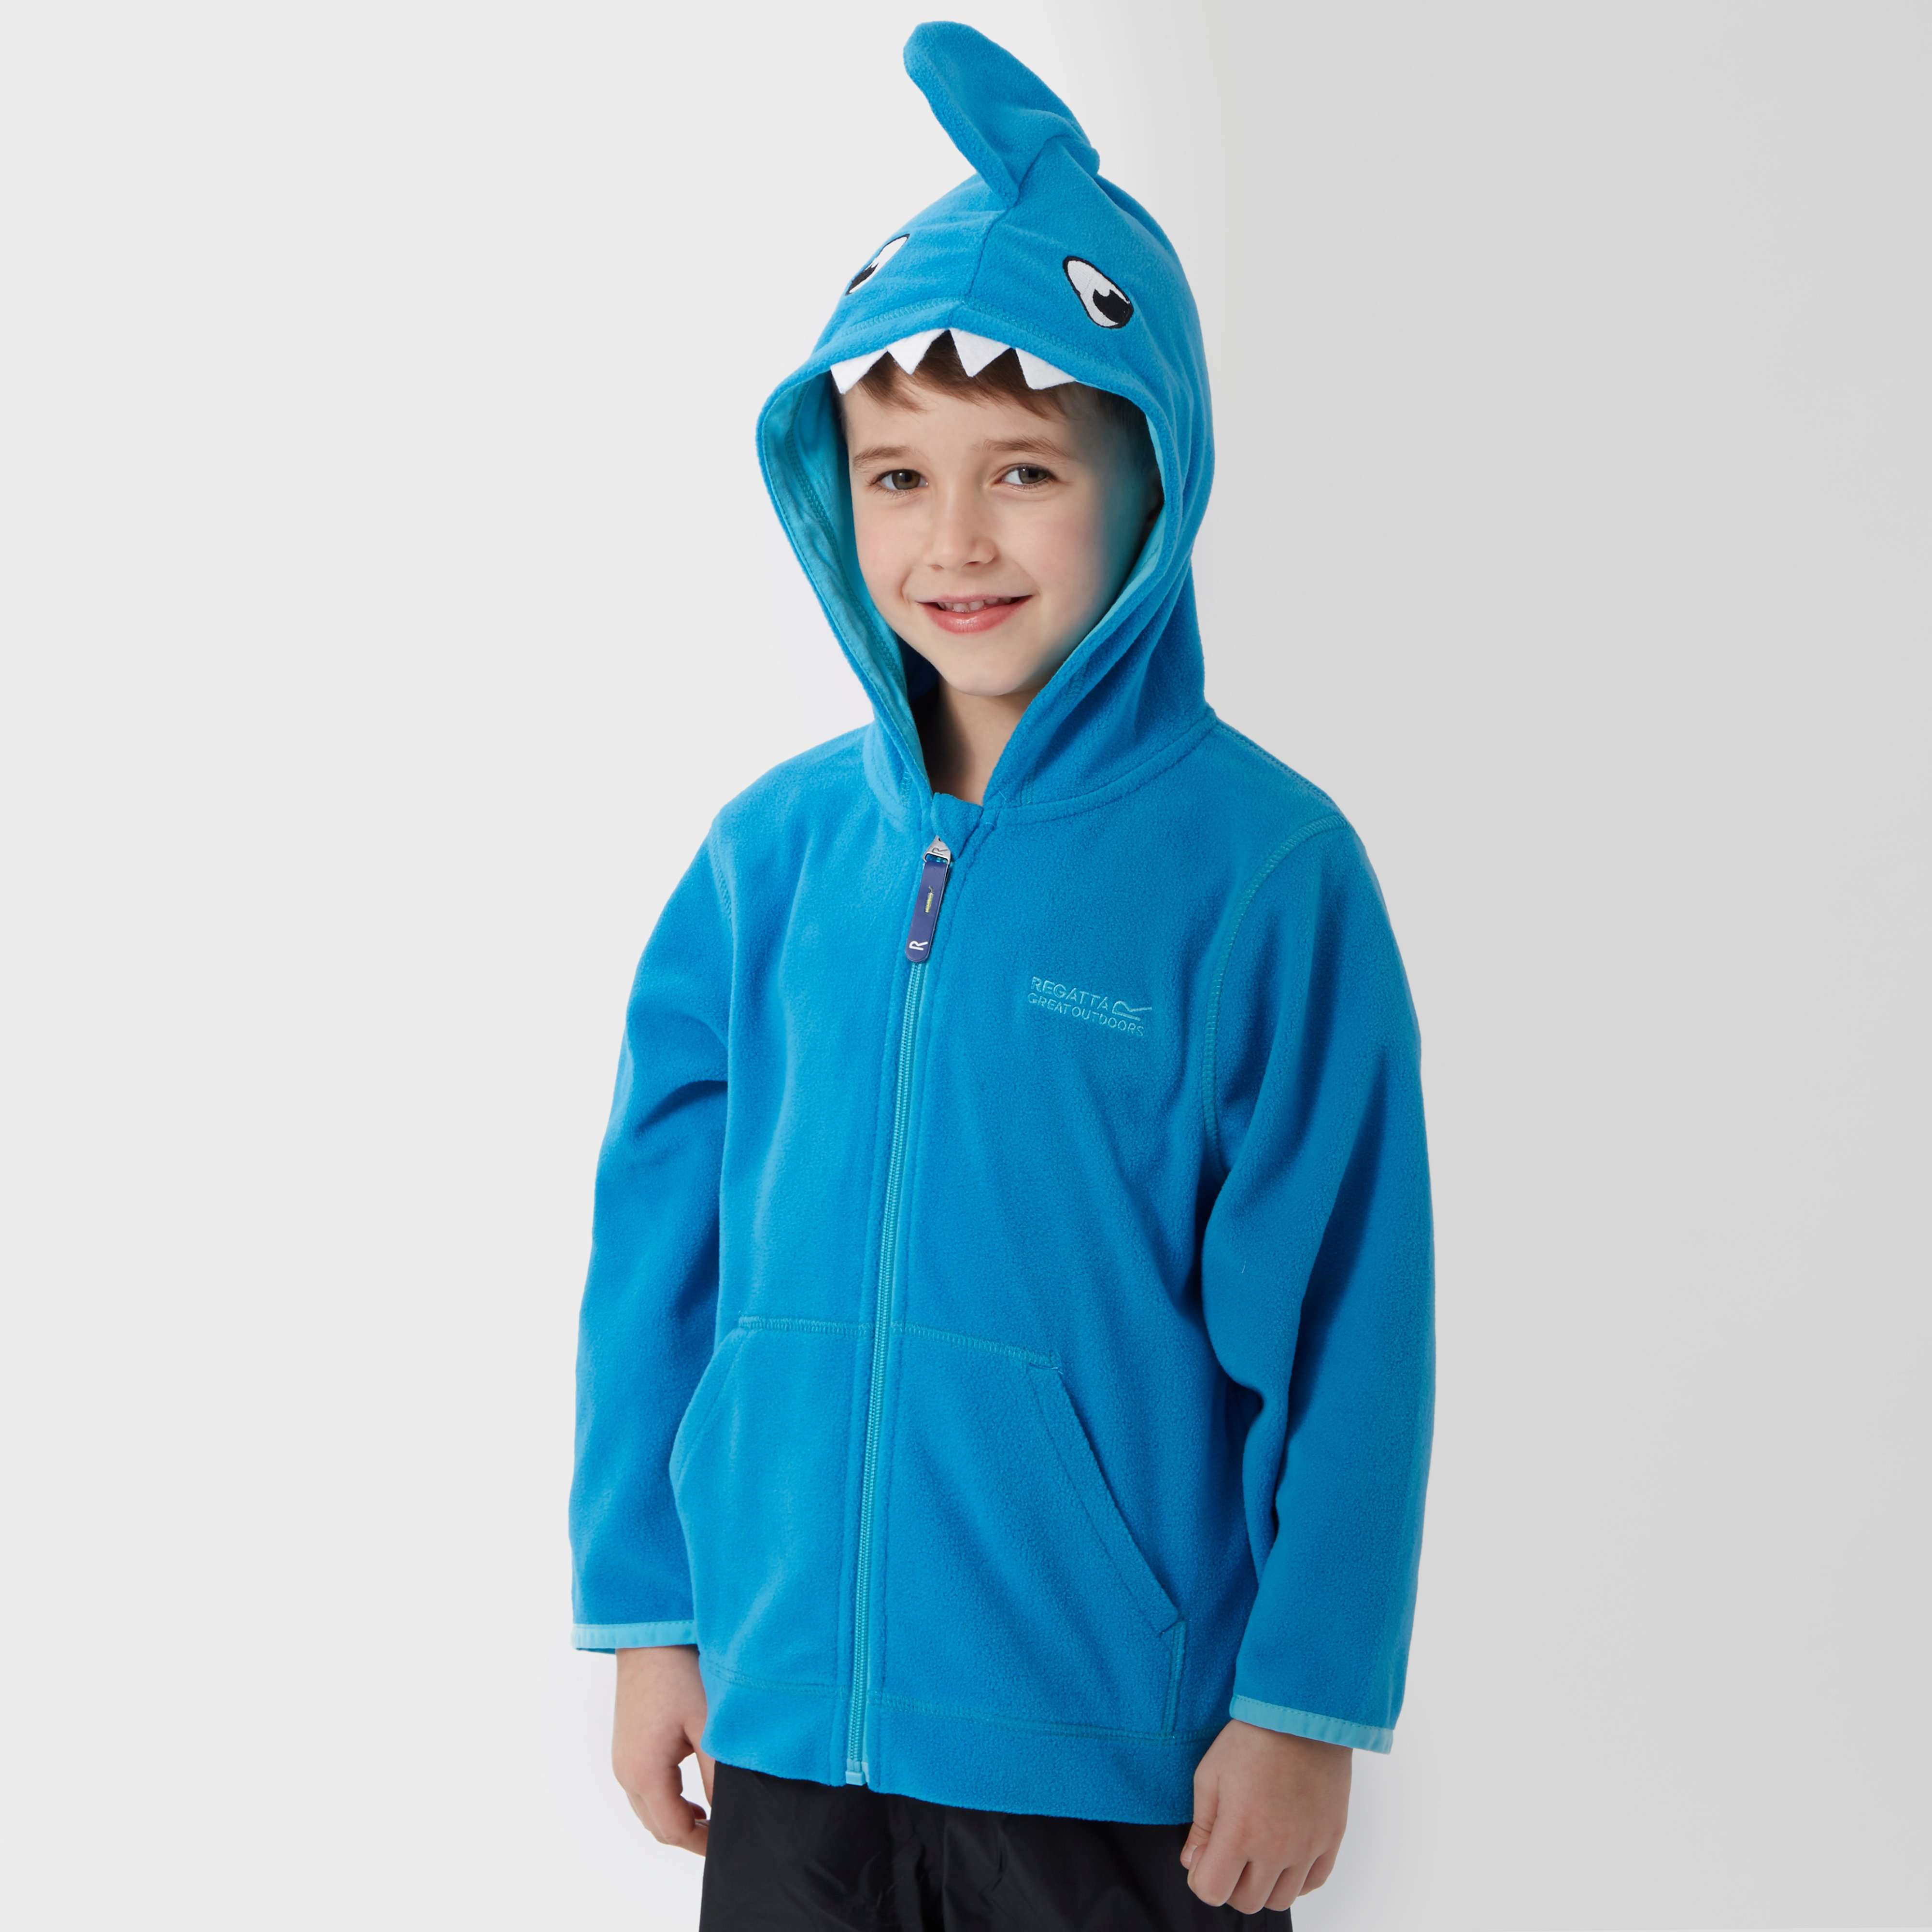 REGATTA Boys' Shark Full Zip Fleece Hoodie